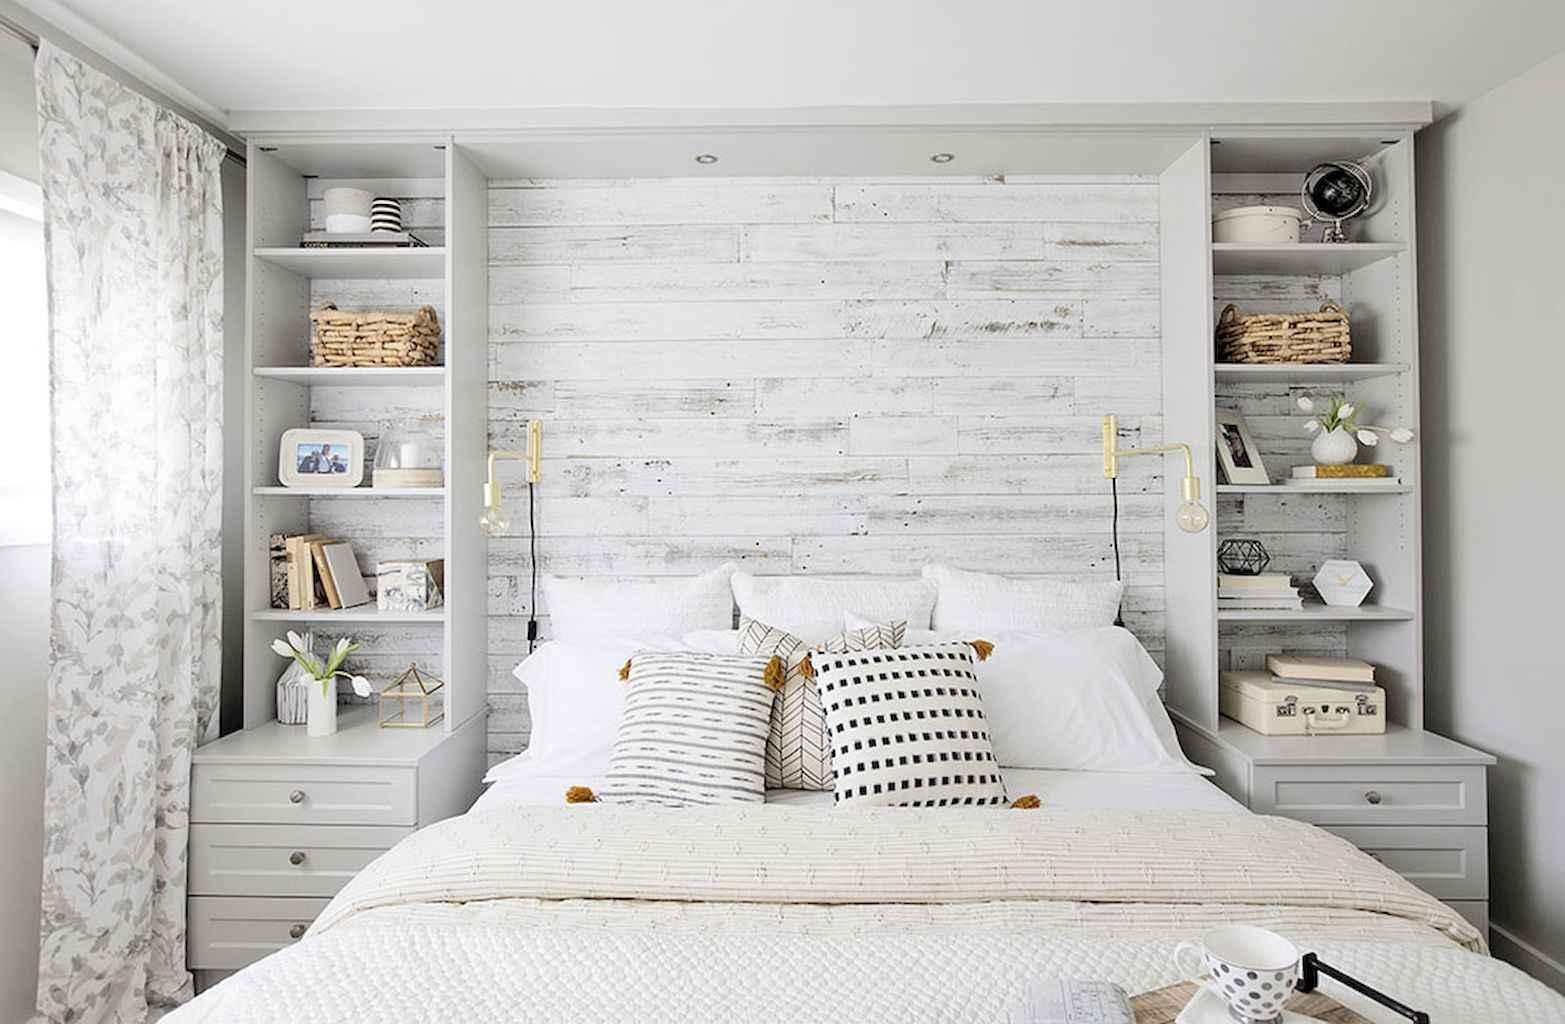 Gorgeous rustic master bedroom design & decor ideas (13)